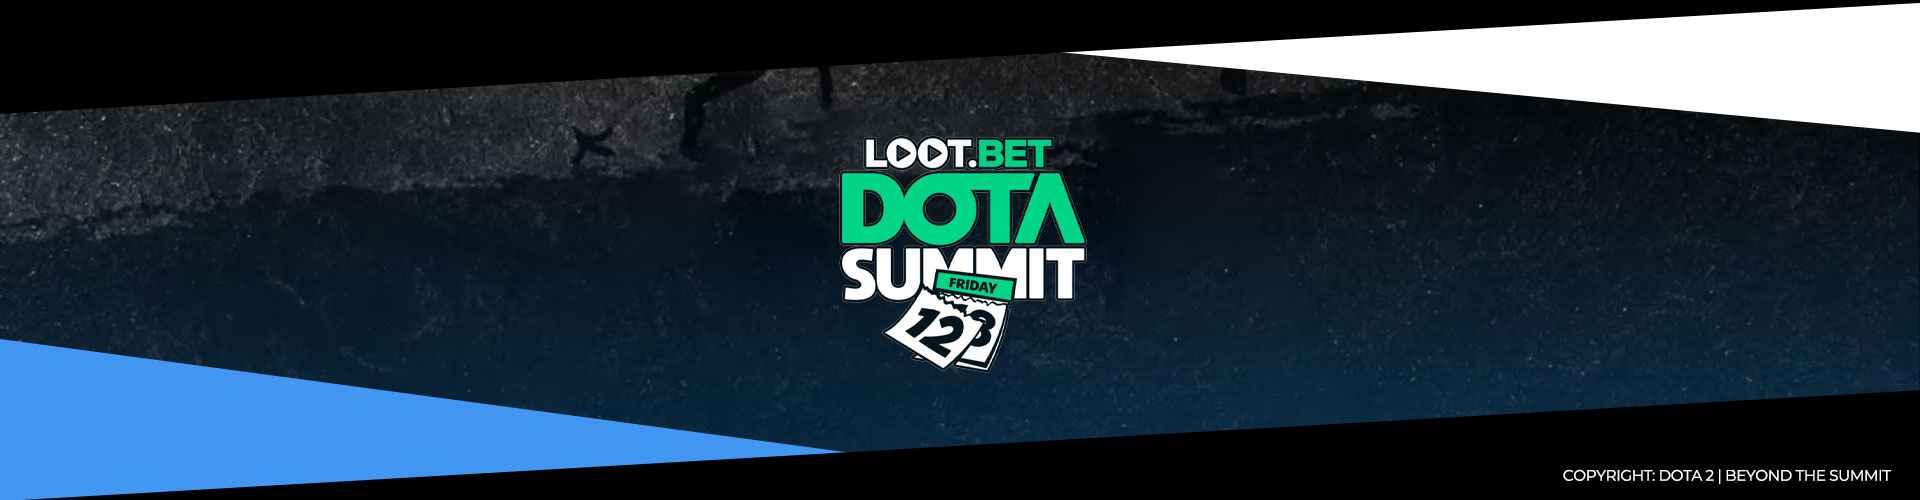 LOOT.BET Dota Summit 12